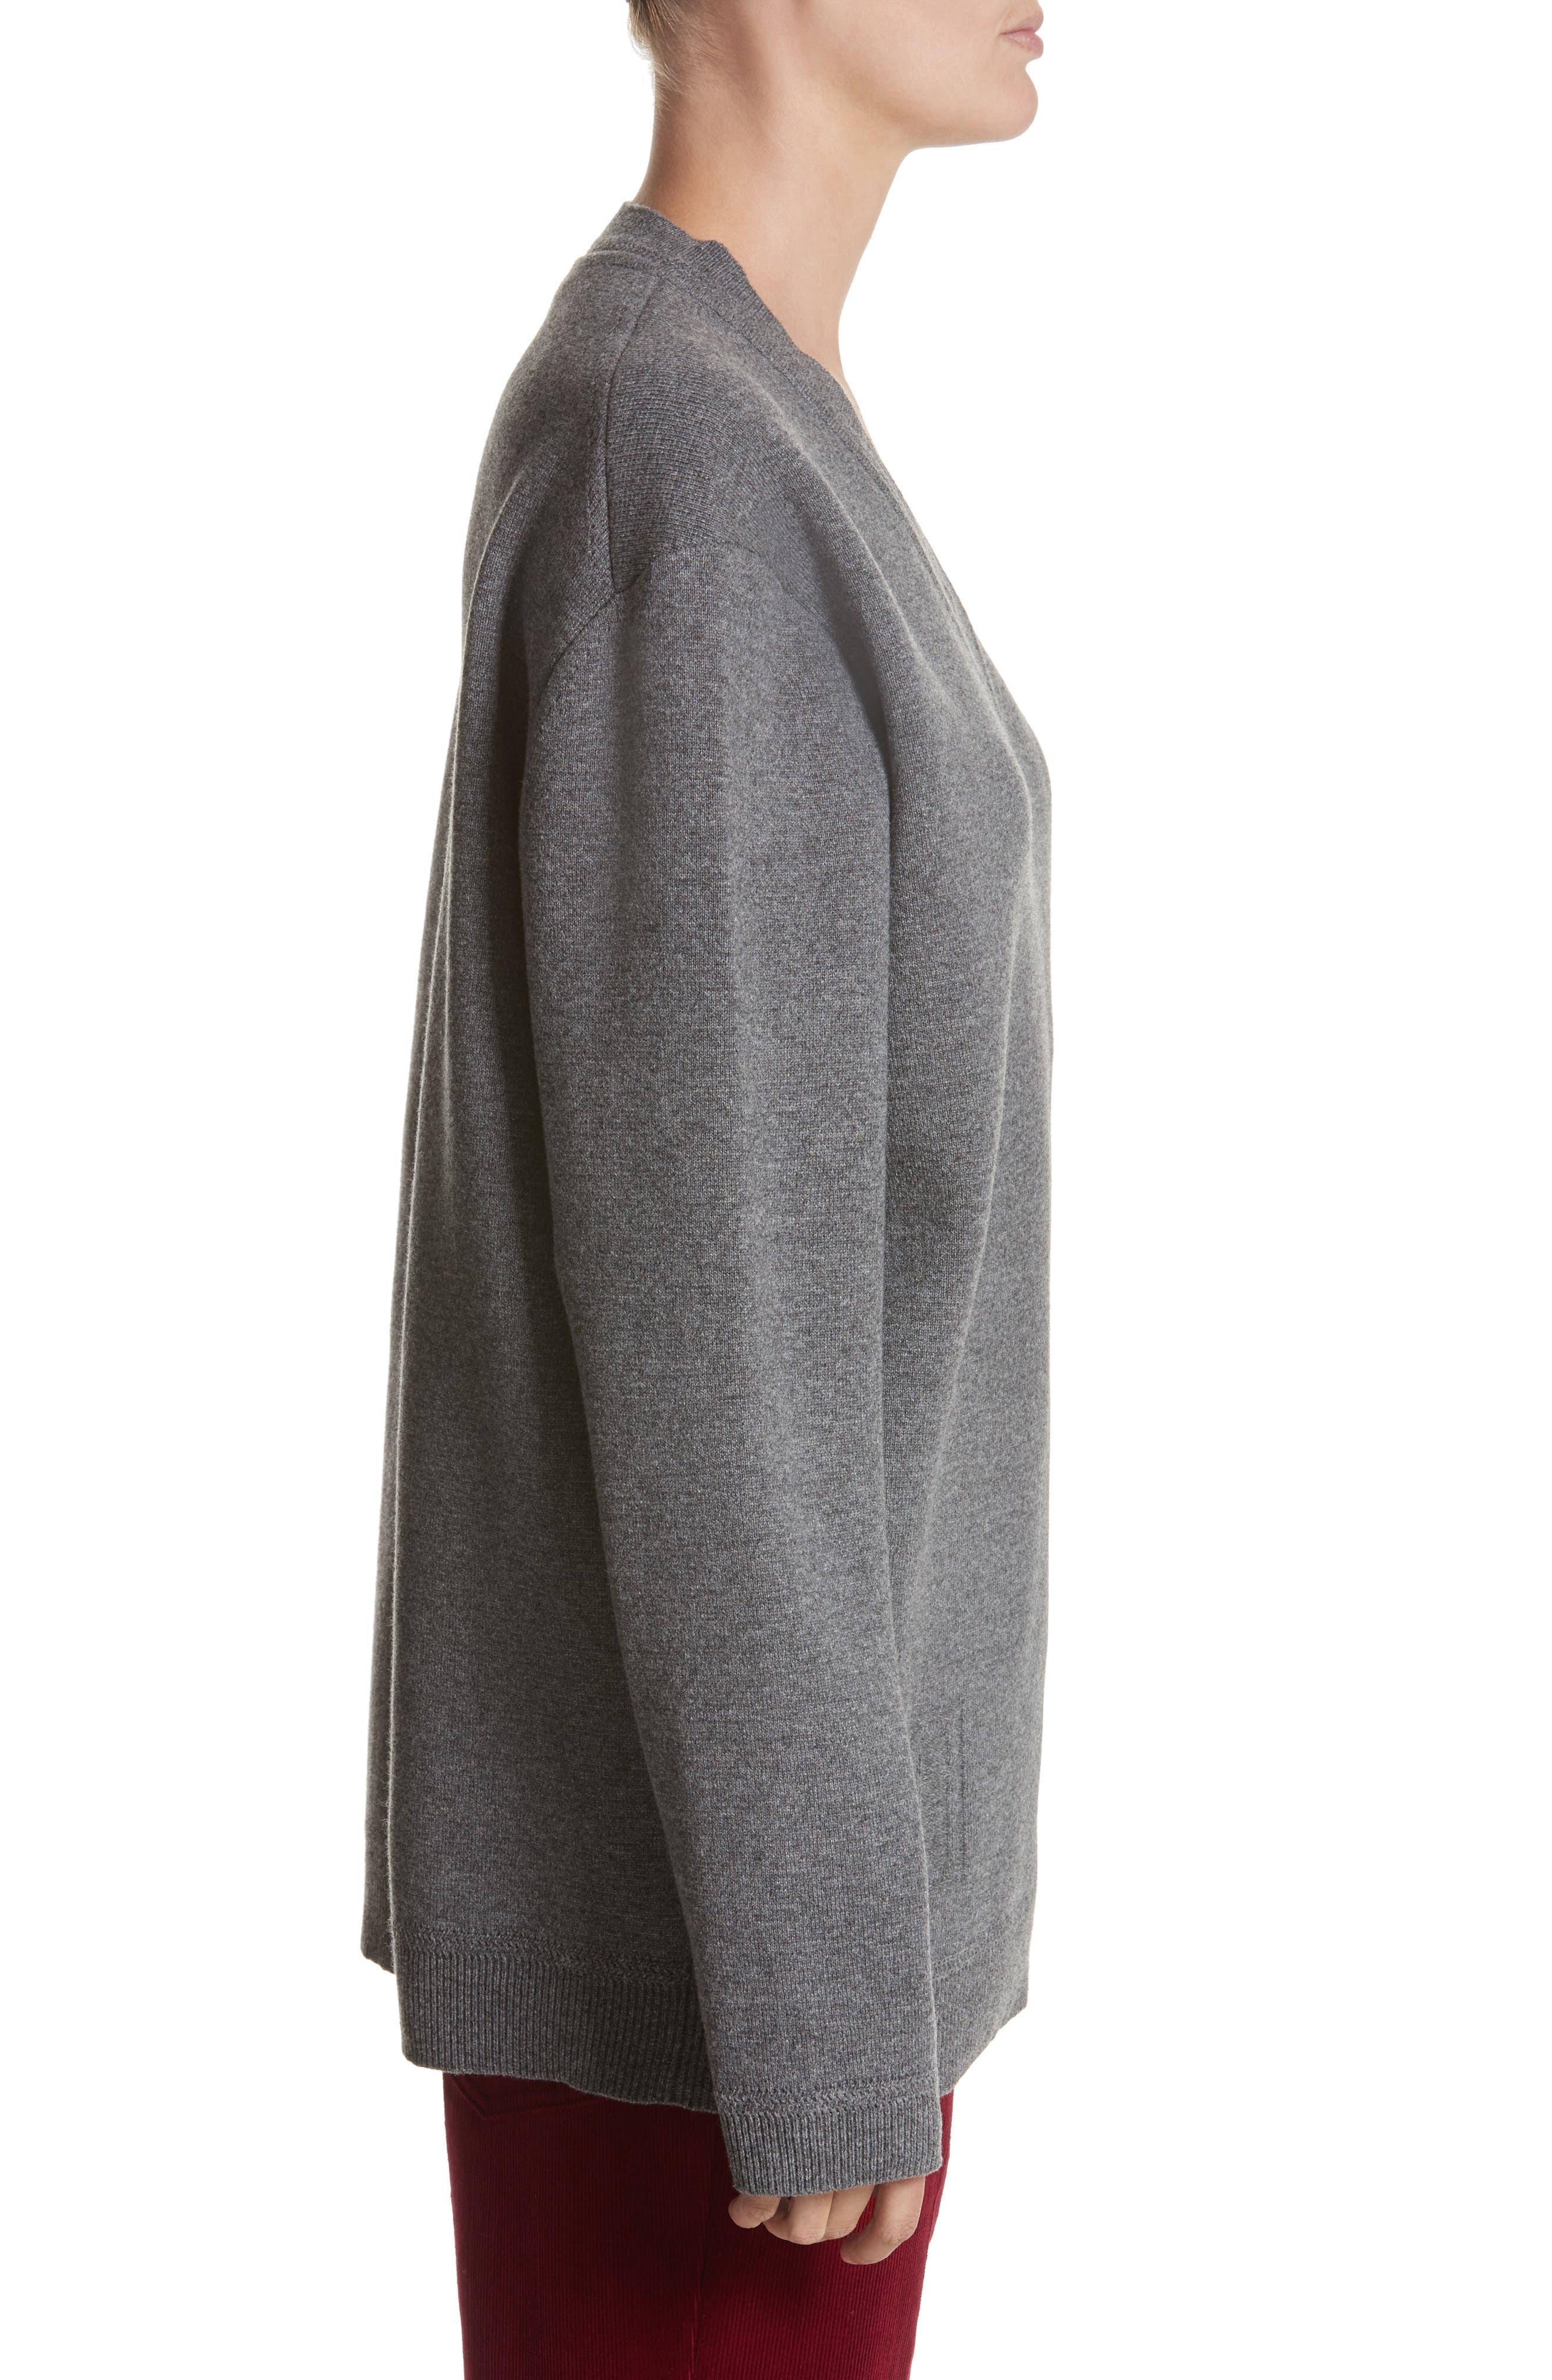 Wool & Cashmere Sweater,                             Alternate thumbnail 6, color,                             Grey Melange